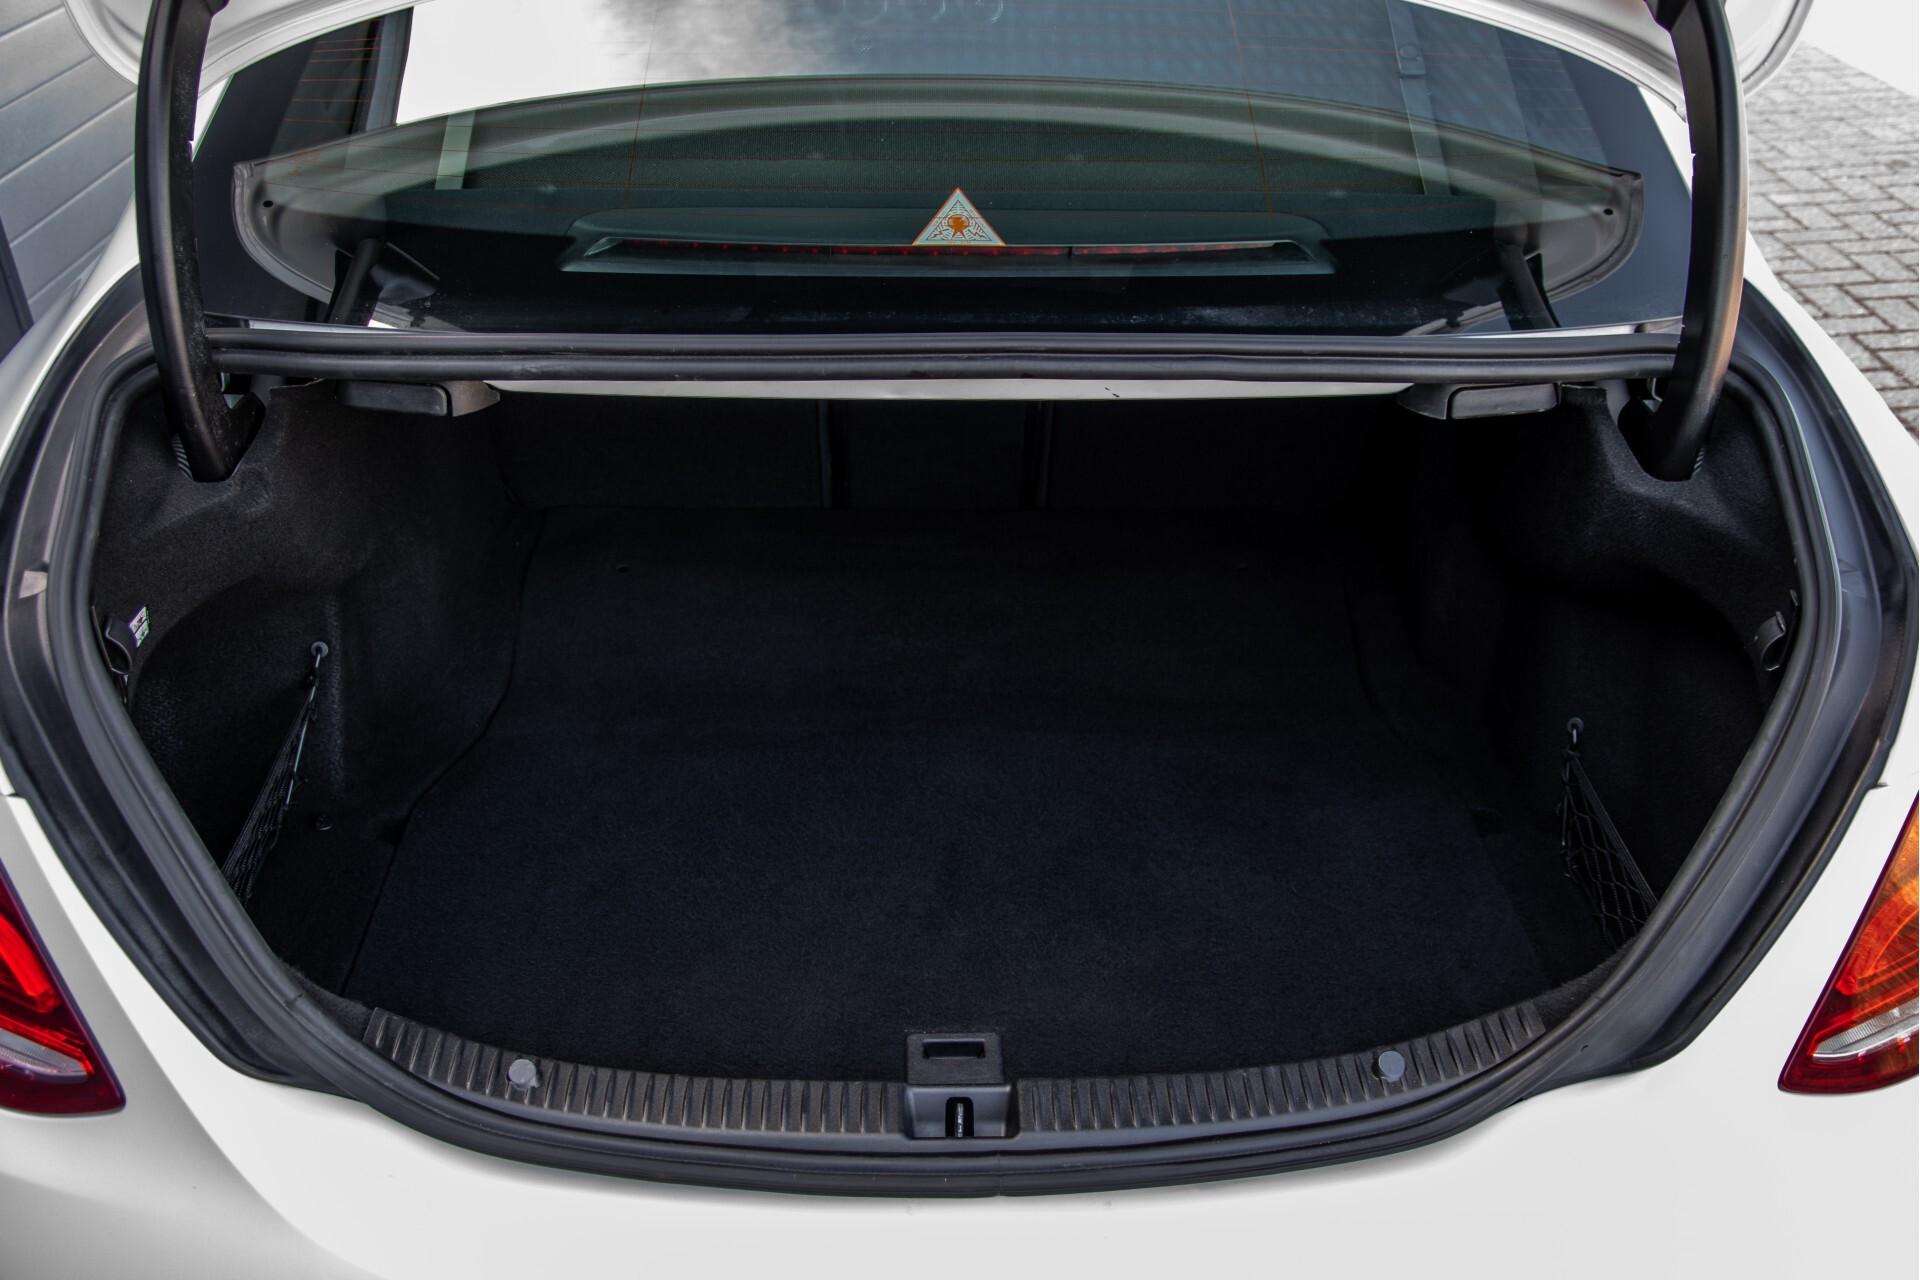 Mercedes-Benz C-Klasse 450/43 AMG 4-M Distronic/Standkachel/Panorama/Keyless/Harman-Kardon/Stoelkoeling Aut7 Foto 57